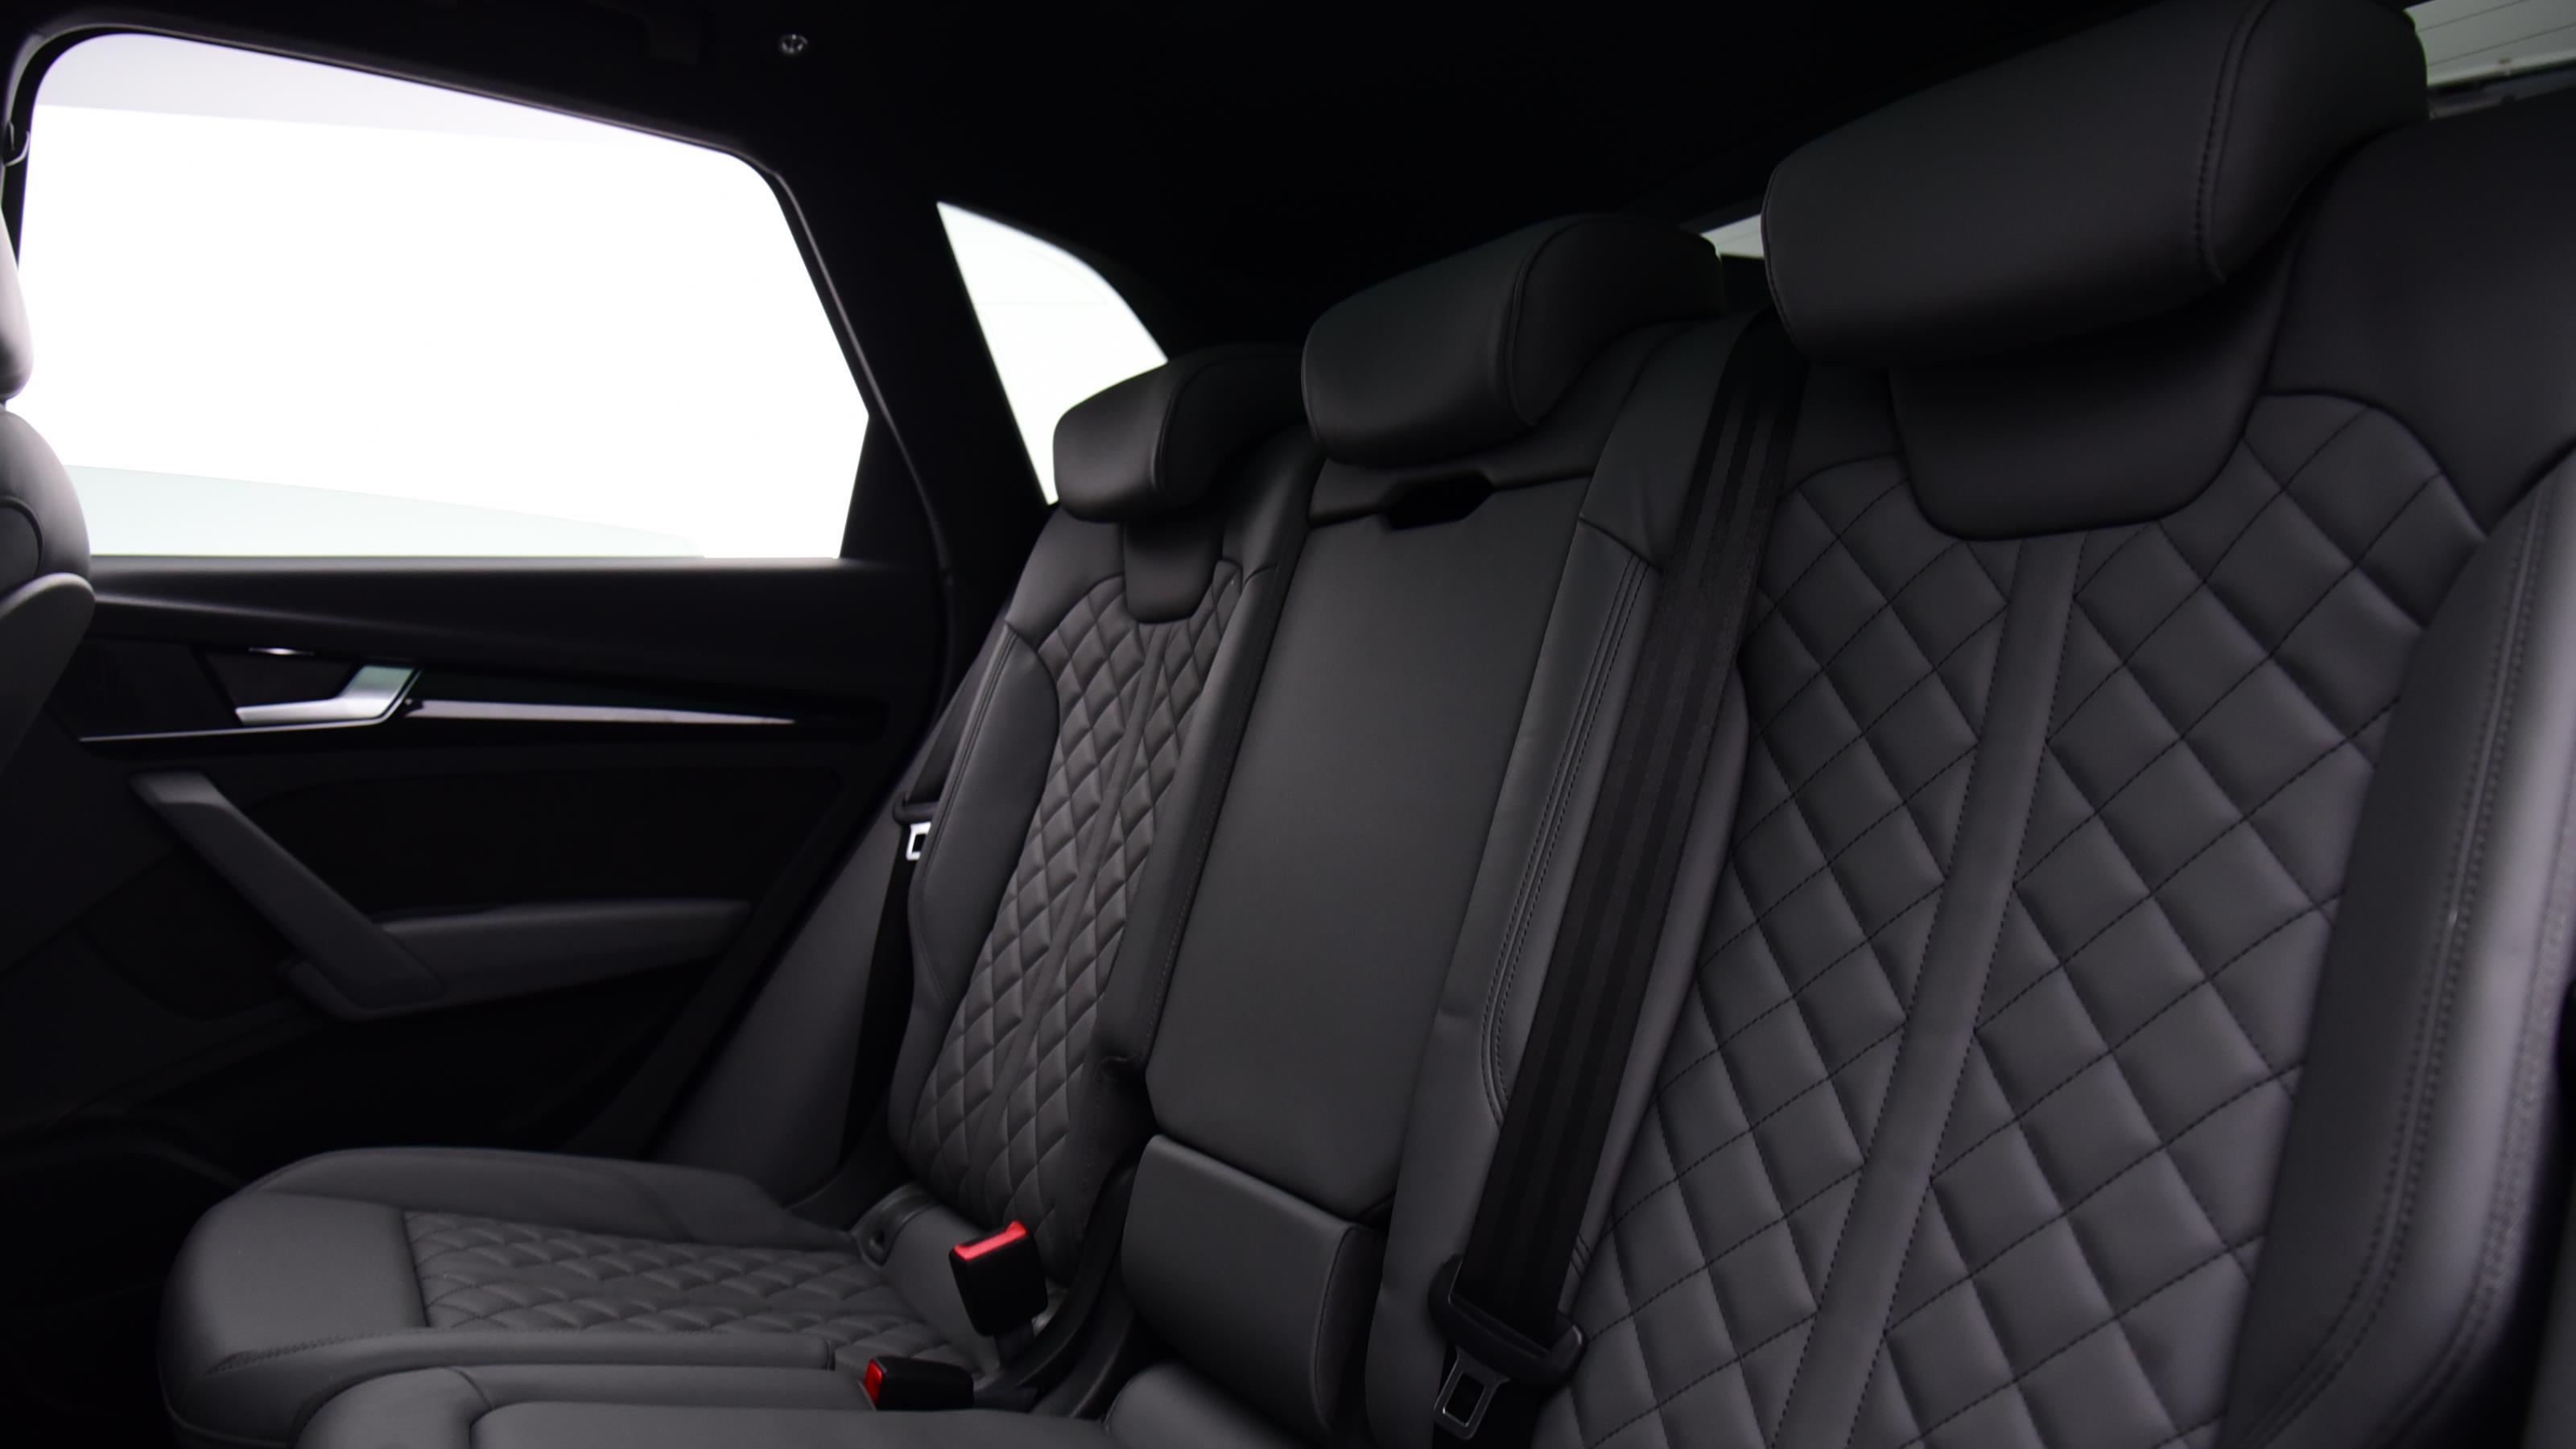 Used 2019 Audi Q5 40 TDI Quattro Black Edition 5dr S Tronic BLUE at Saxton4x4